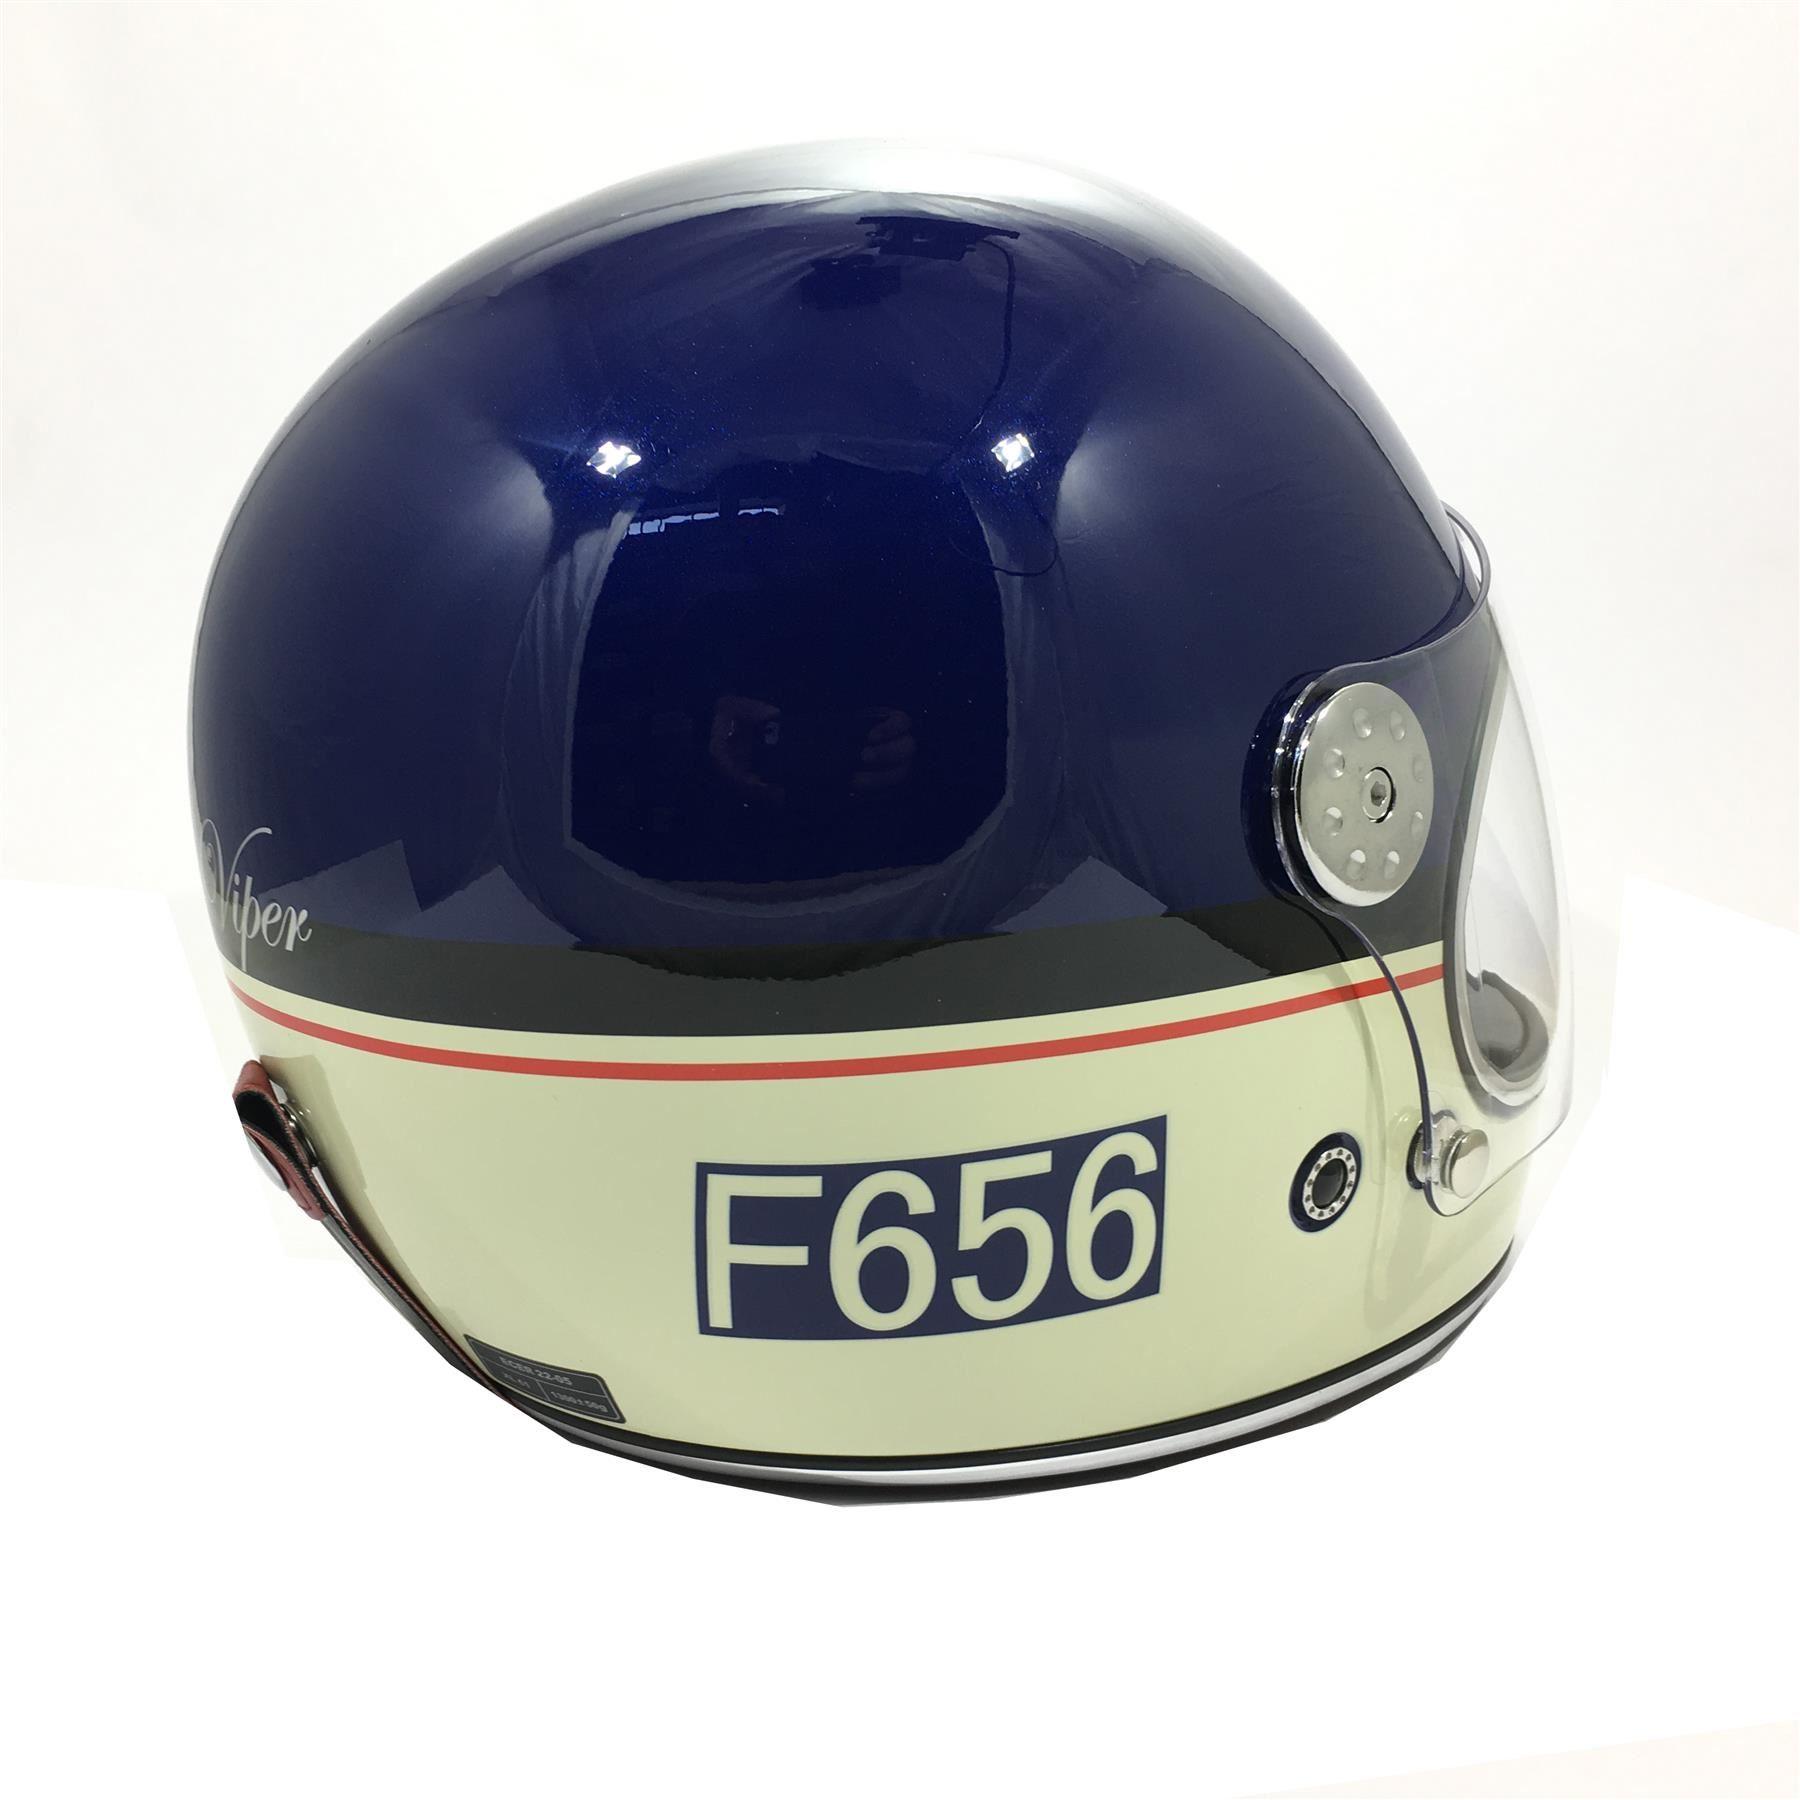 Viper-F656-Retro-Vintage-FibreGlass-Full-Face-Motorcycle-Bike-Road-Crash-Helmet miniature 23